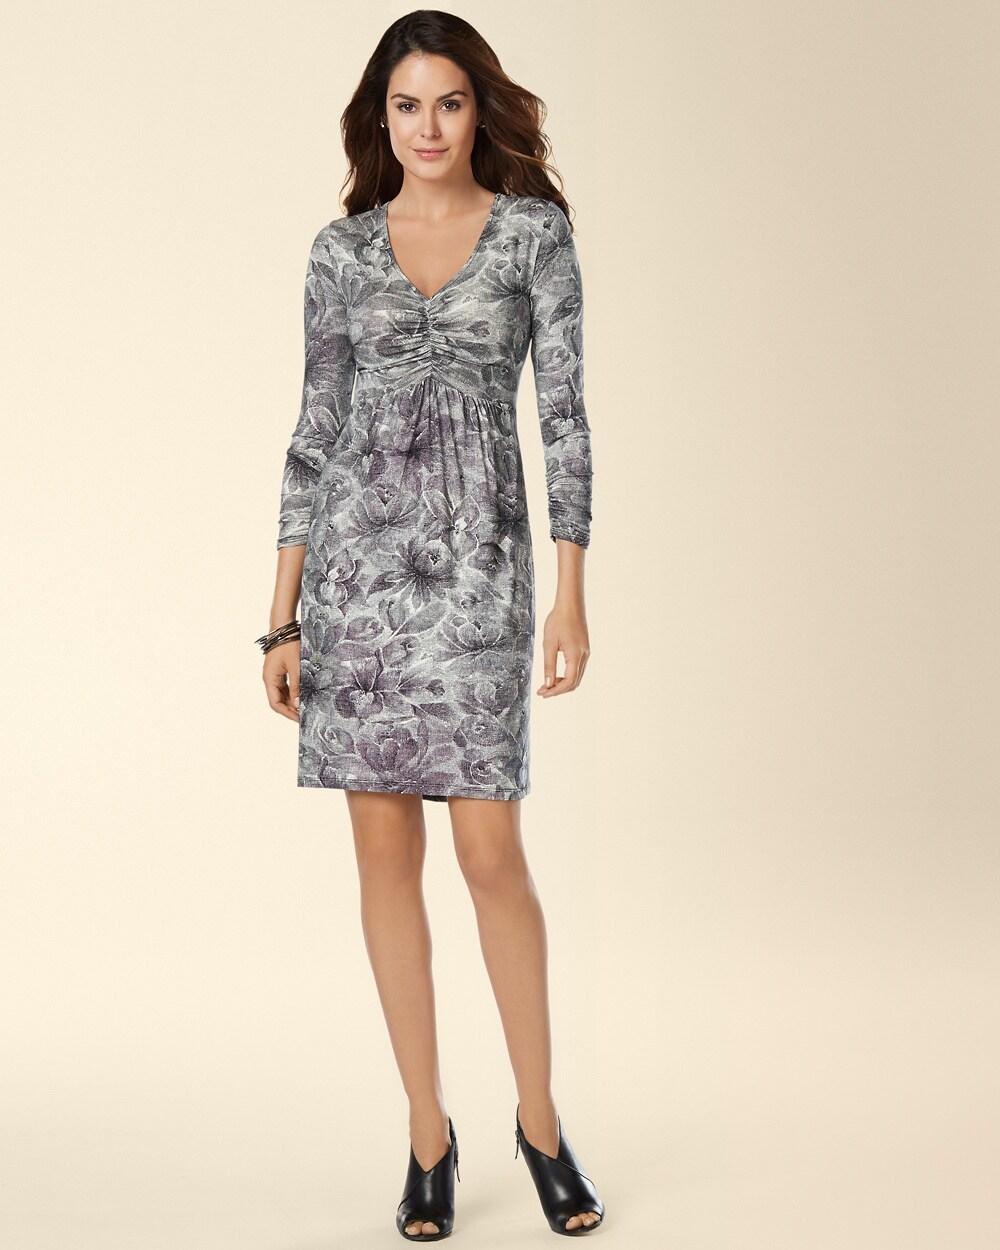 Leota Long Sleeve V-Neck Shirred Short Dress - Soma eb9fa2263